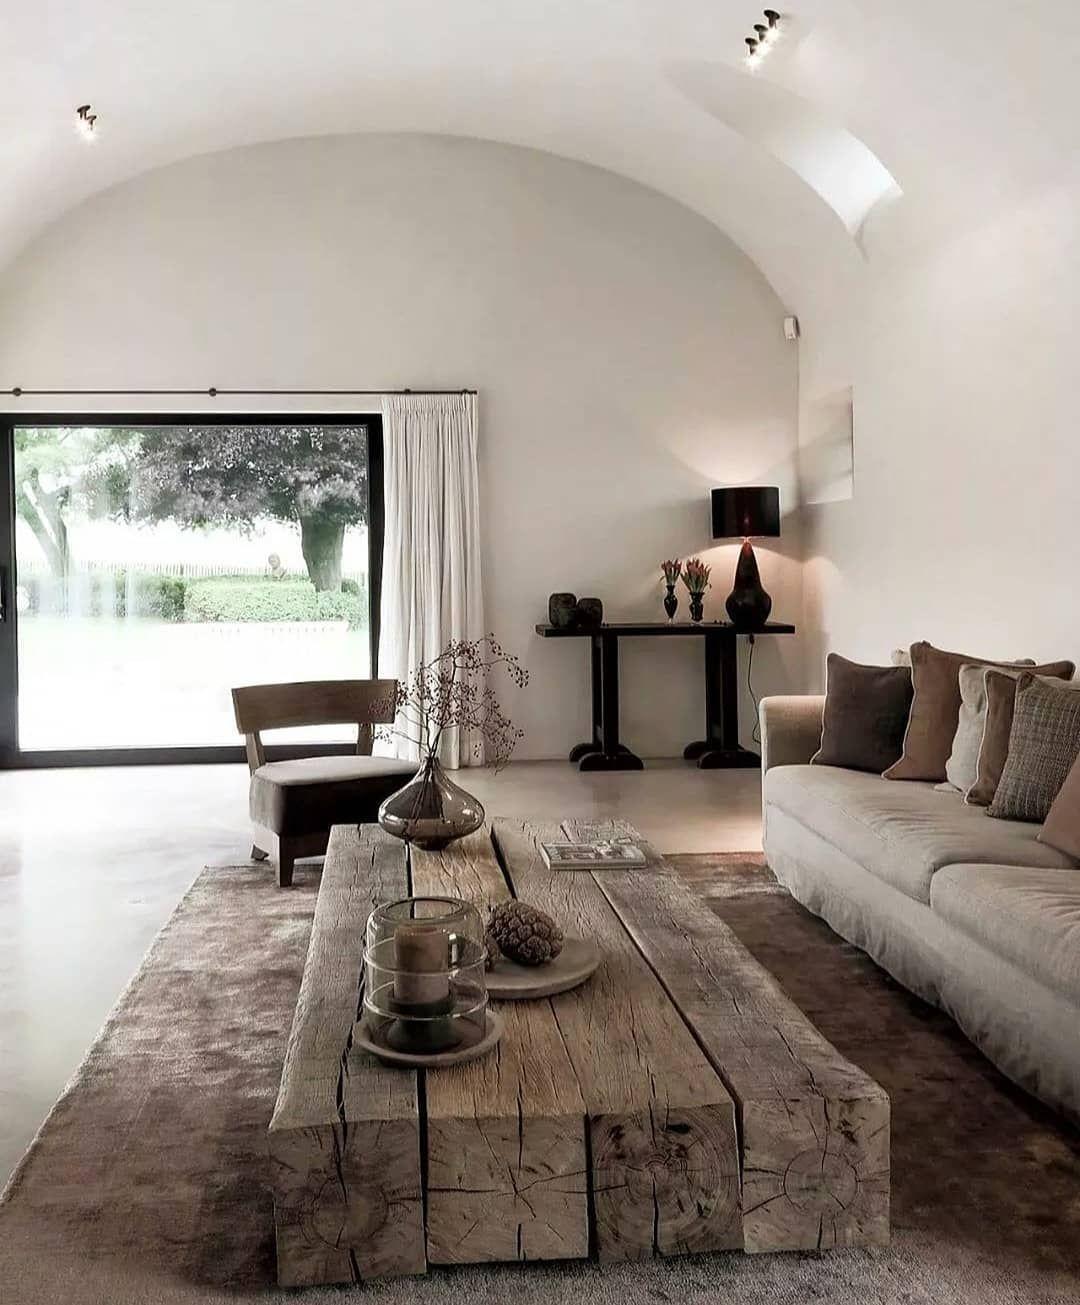 N A T H A N L I N D B E R G On Instagram Beautiful Modern Rustic Interior Design Resi Rustic Interiors Interior Design Living Room Scandi Style Living Room [ 1305 x 1080 Pixel ]